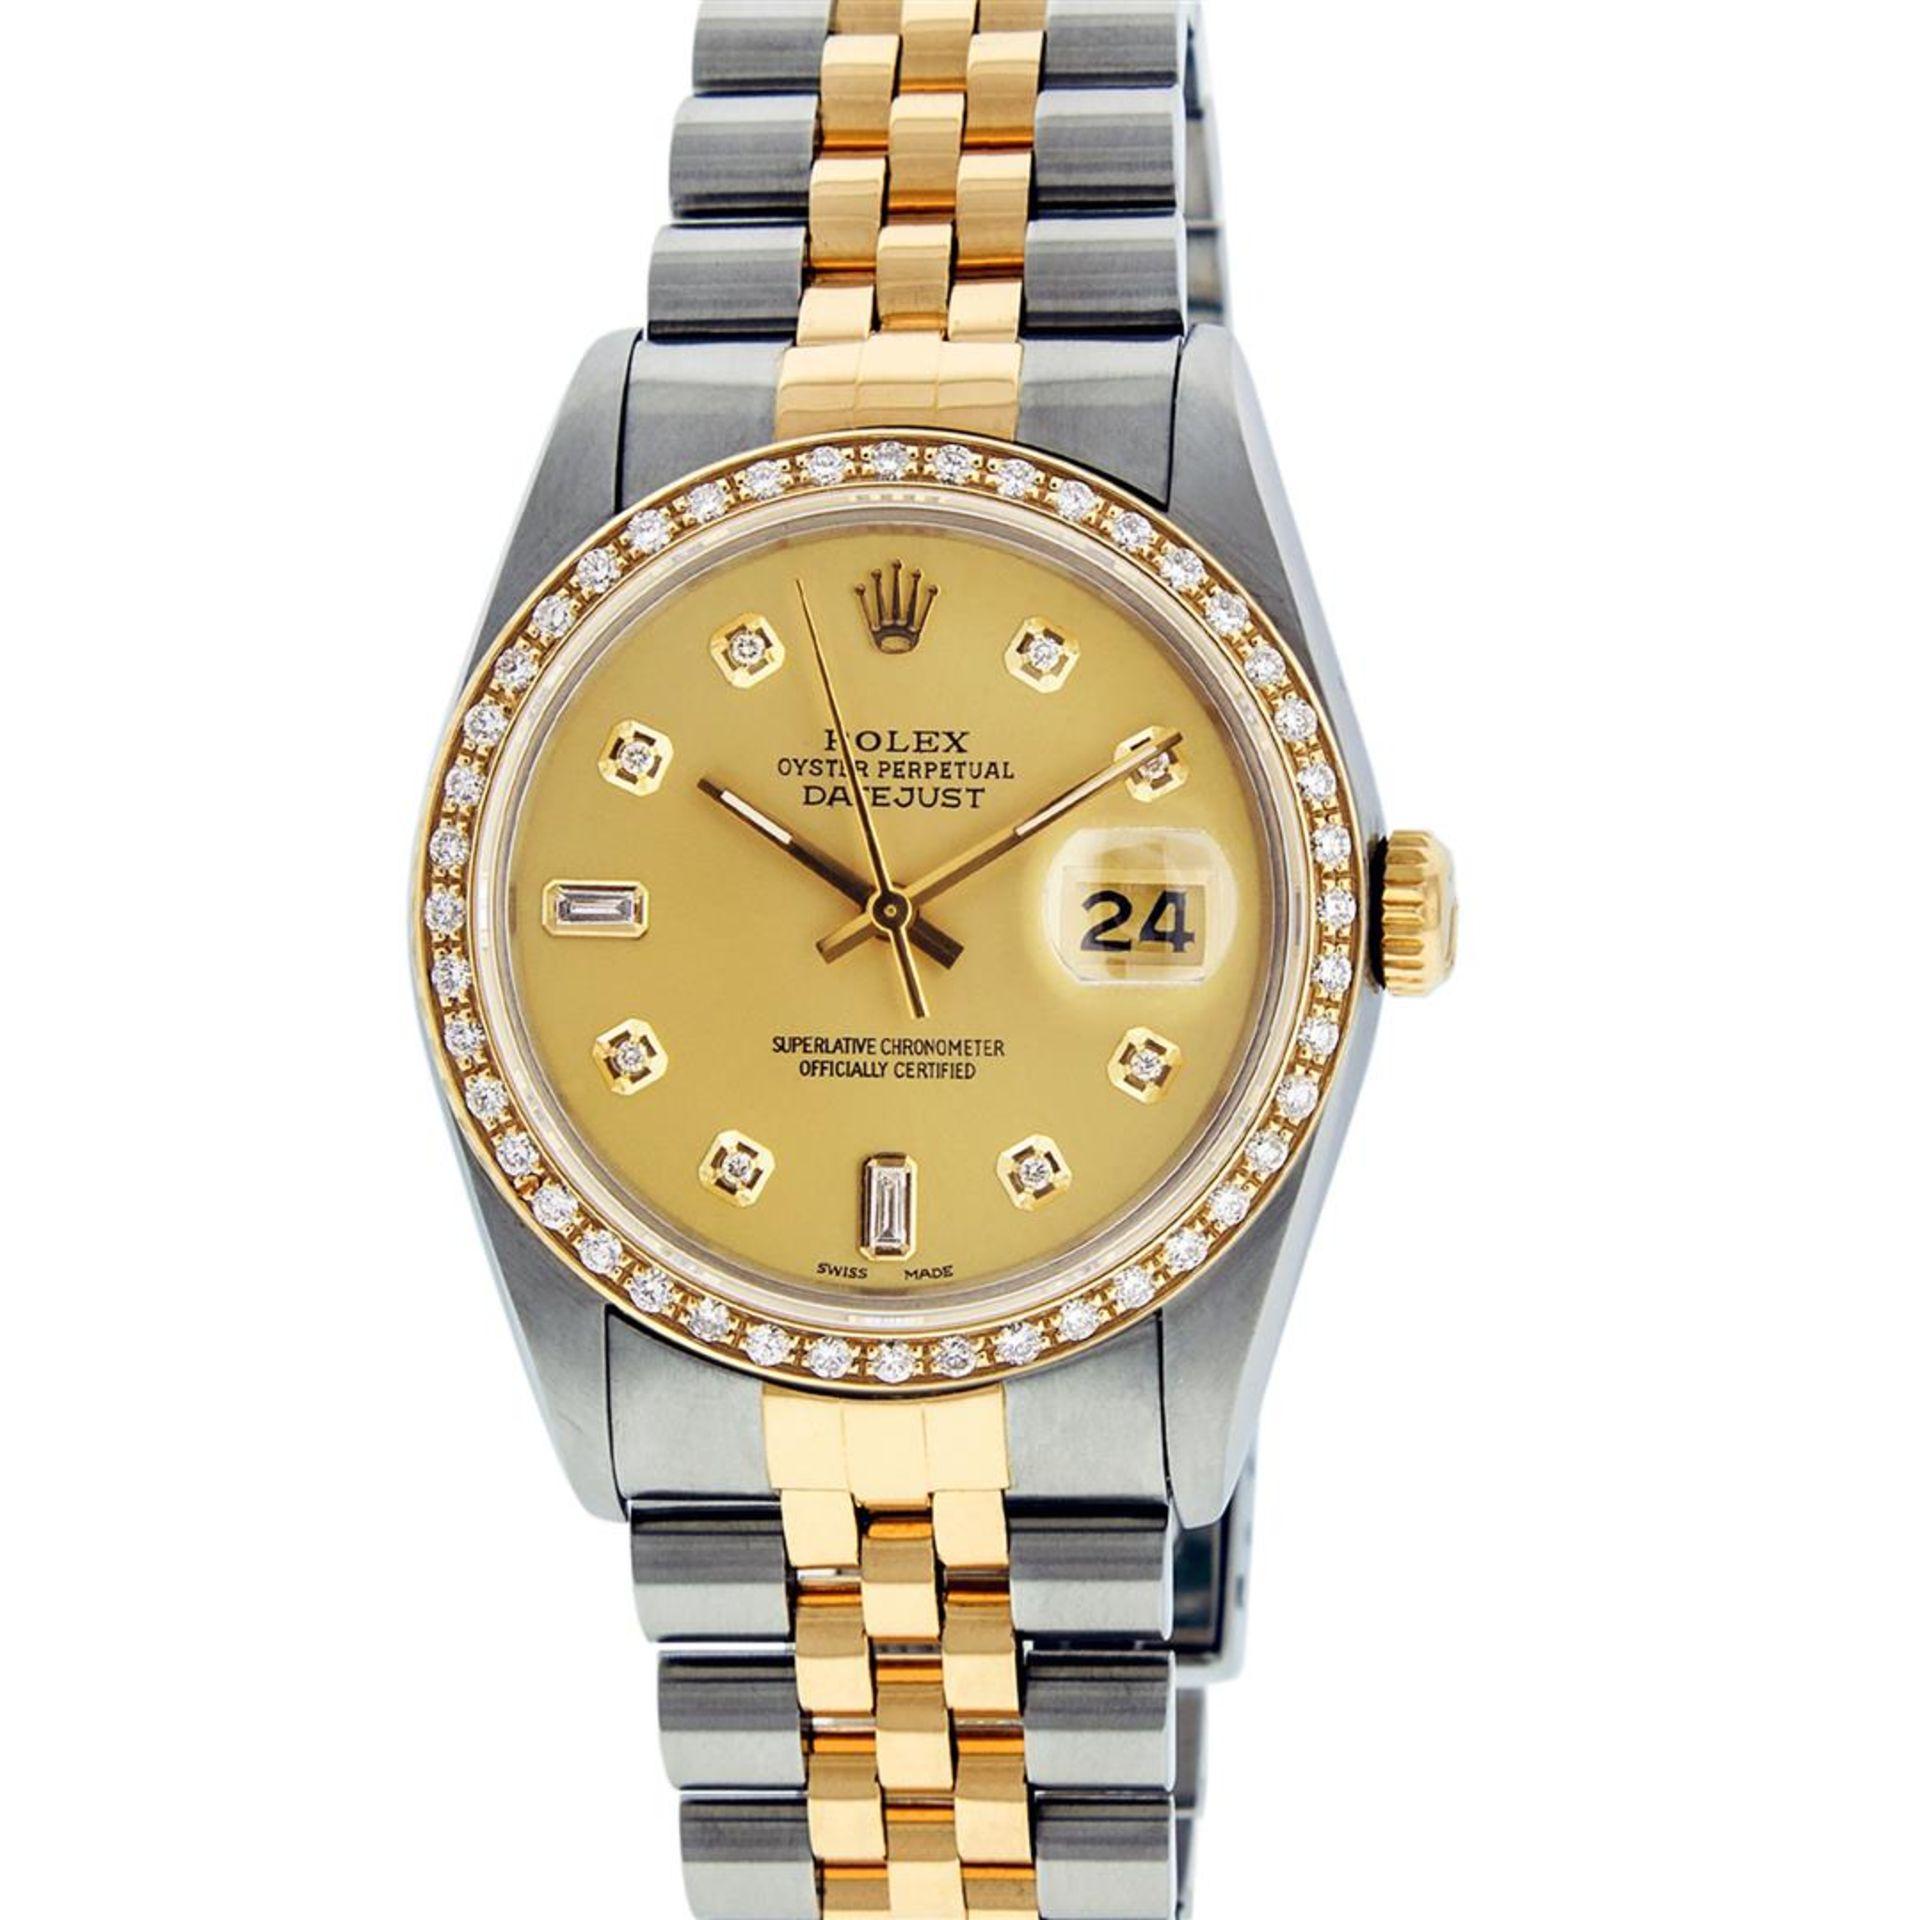 Rolex Mens 2 Tone Champagne Diamond 36MM Datejust Wriswatch - Image 3 of 9